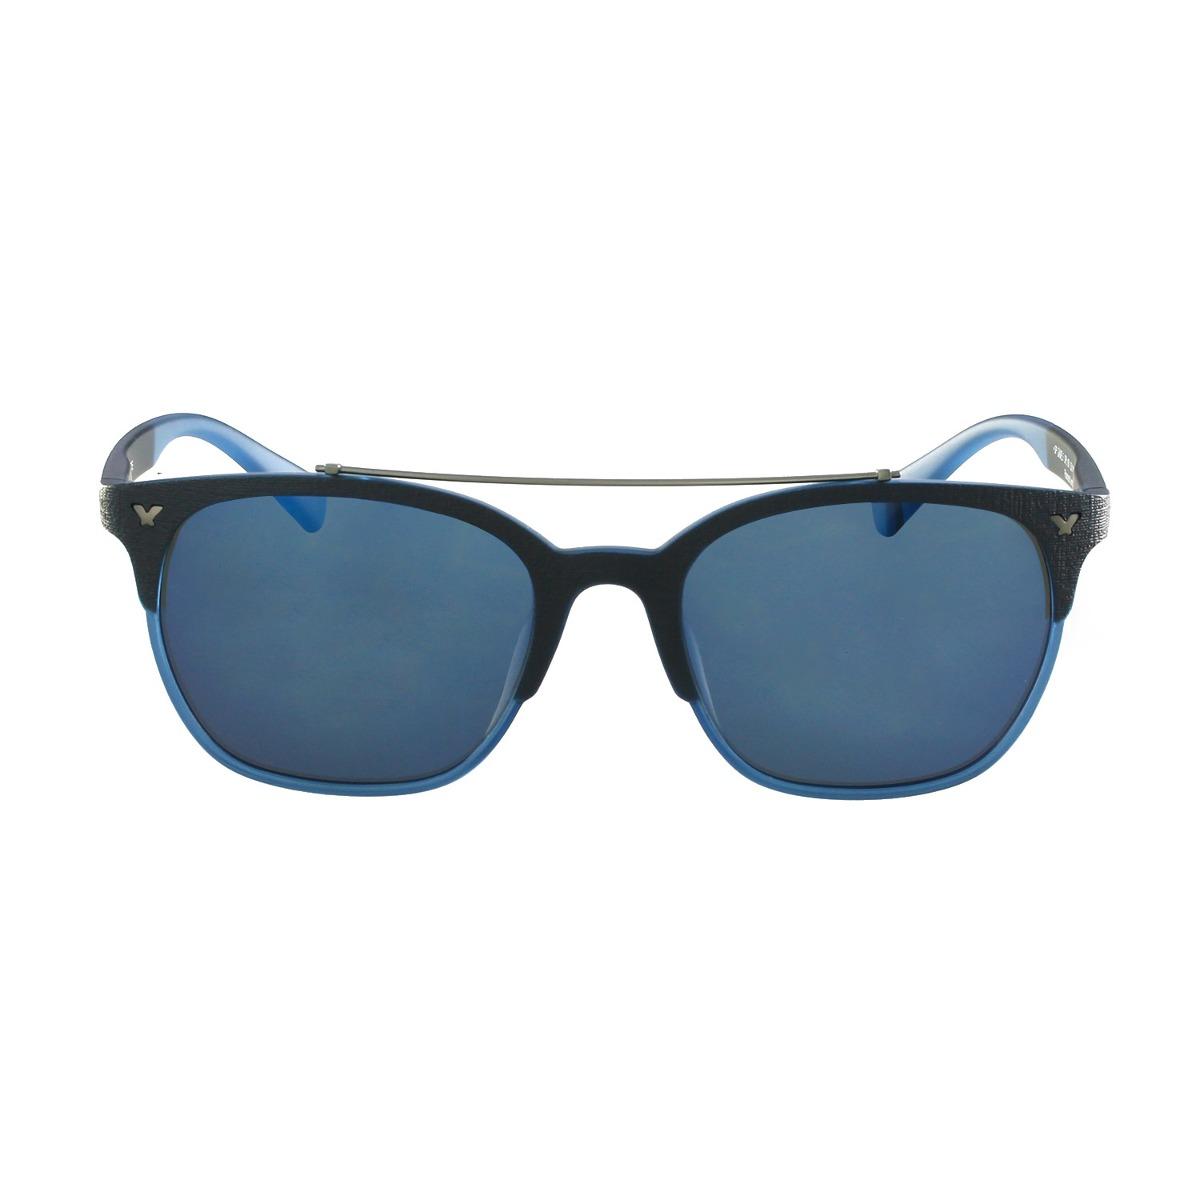 0bf05ad1d9069 Óculos De Sol Police Casual Azul - R  550,00 em Mercado Livre